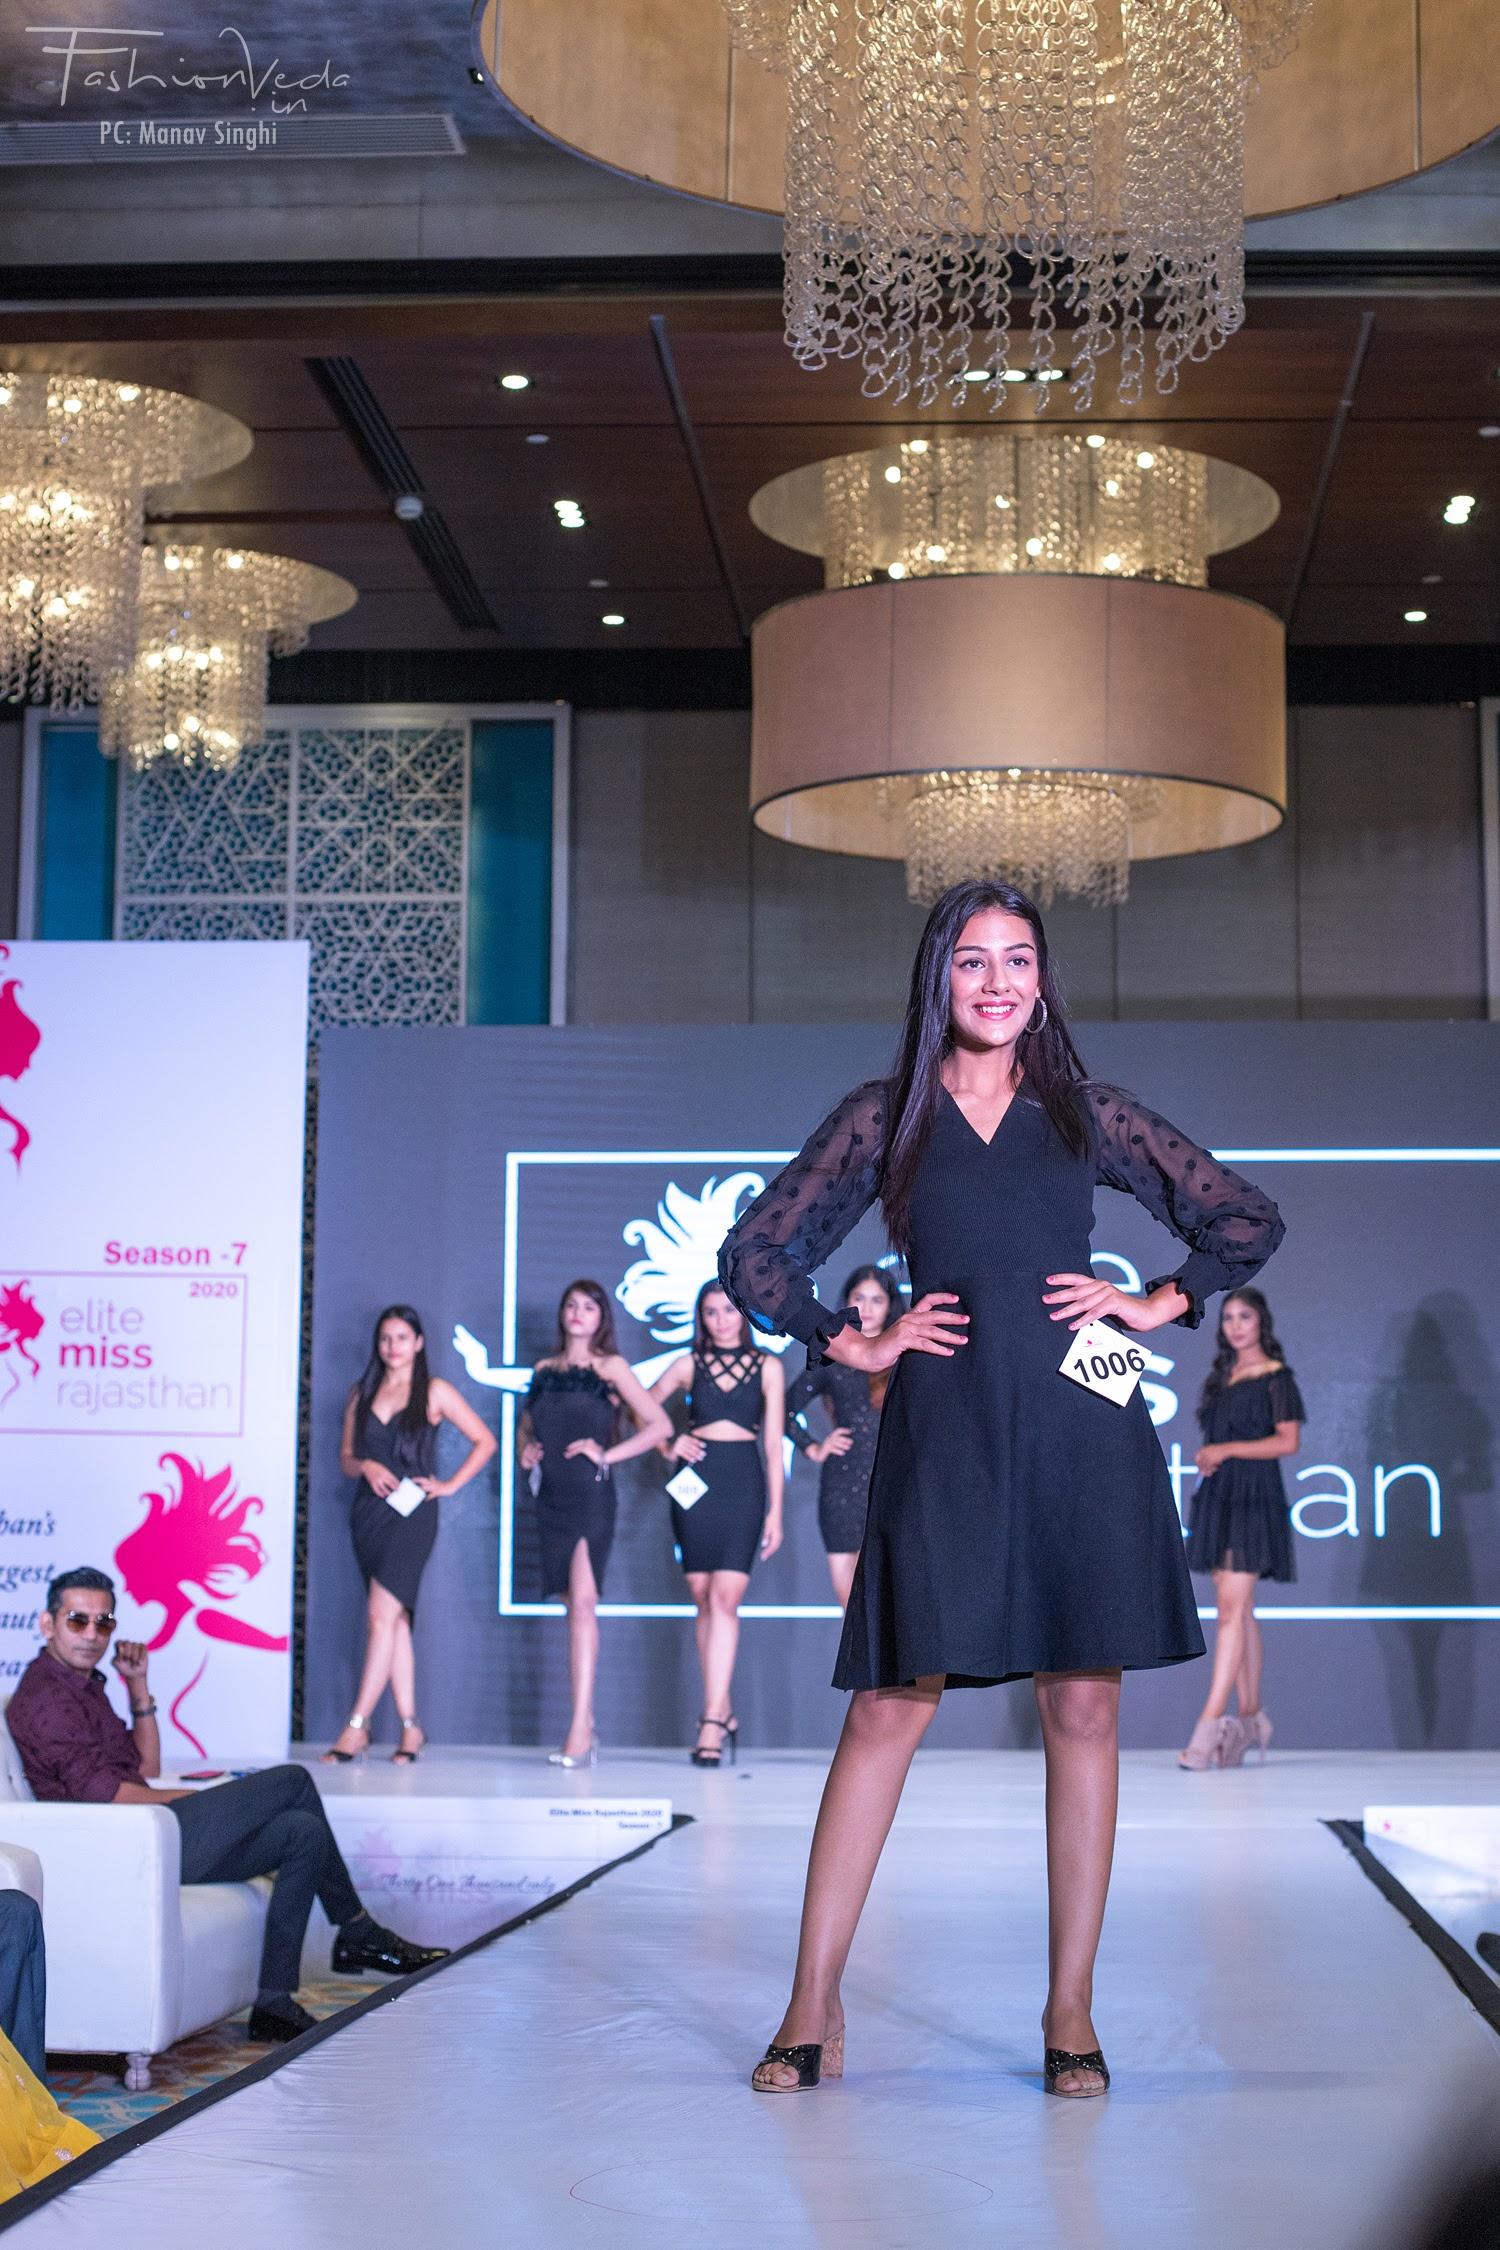 First round of Jaipur audition of Elite Miss Rajasthan 2020, season 7.